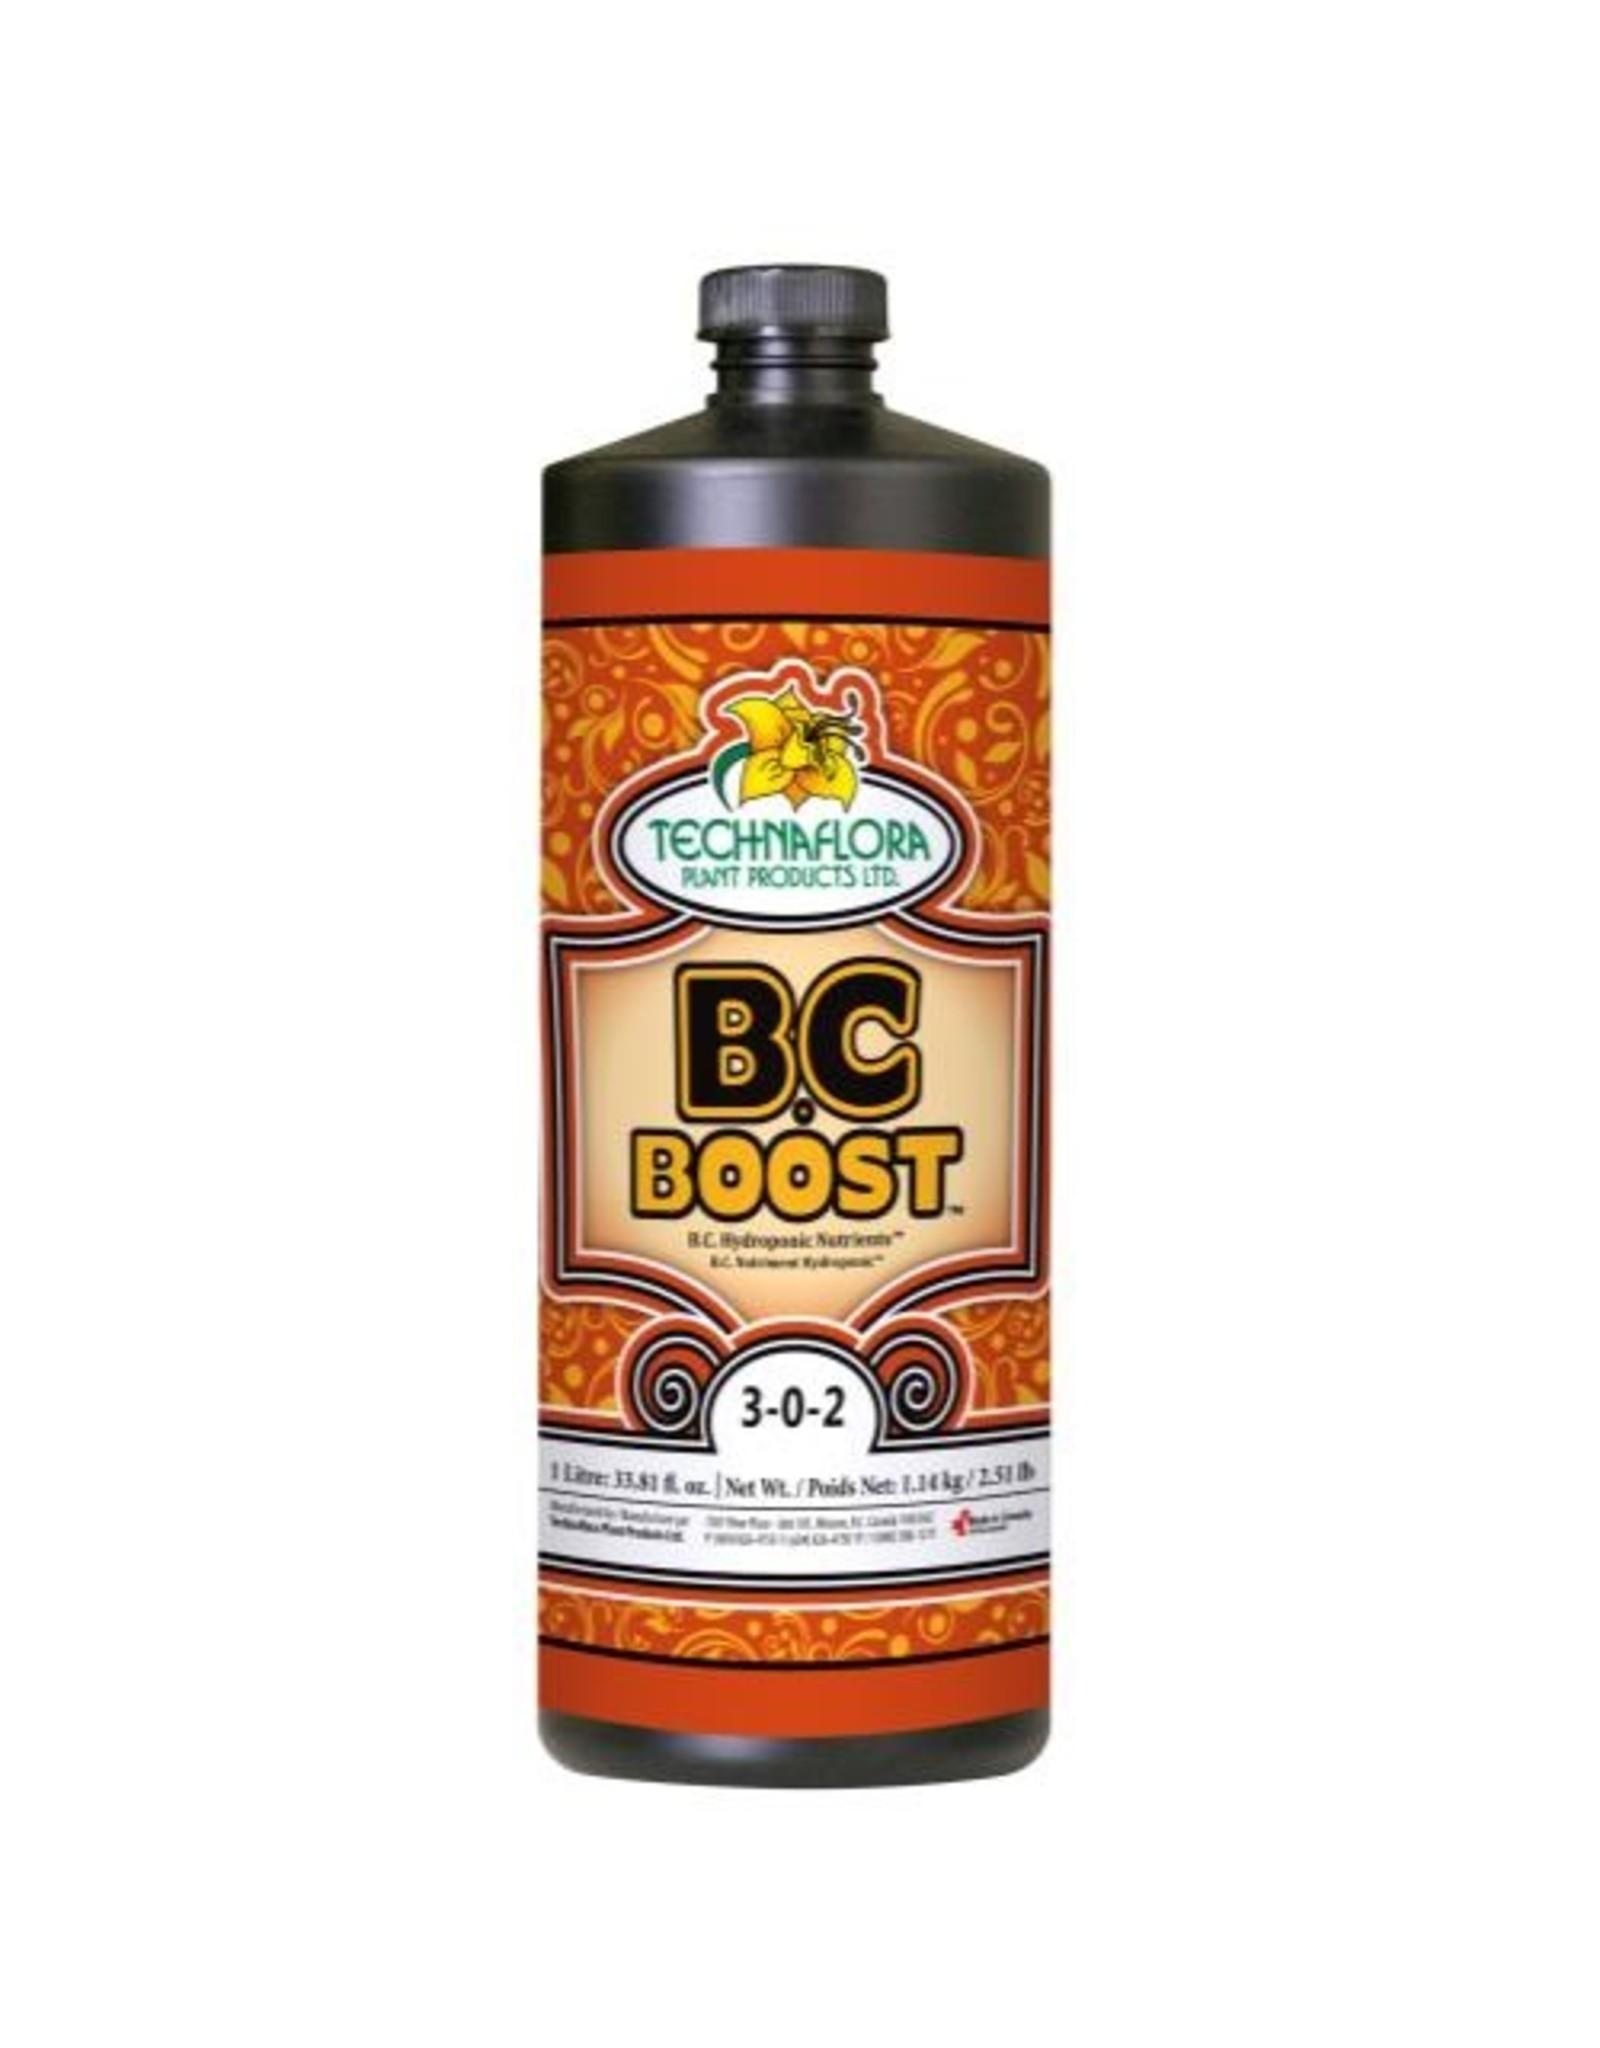 Technaflora Technaflora BC Boost - 1L